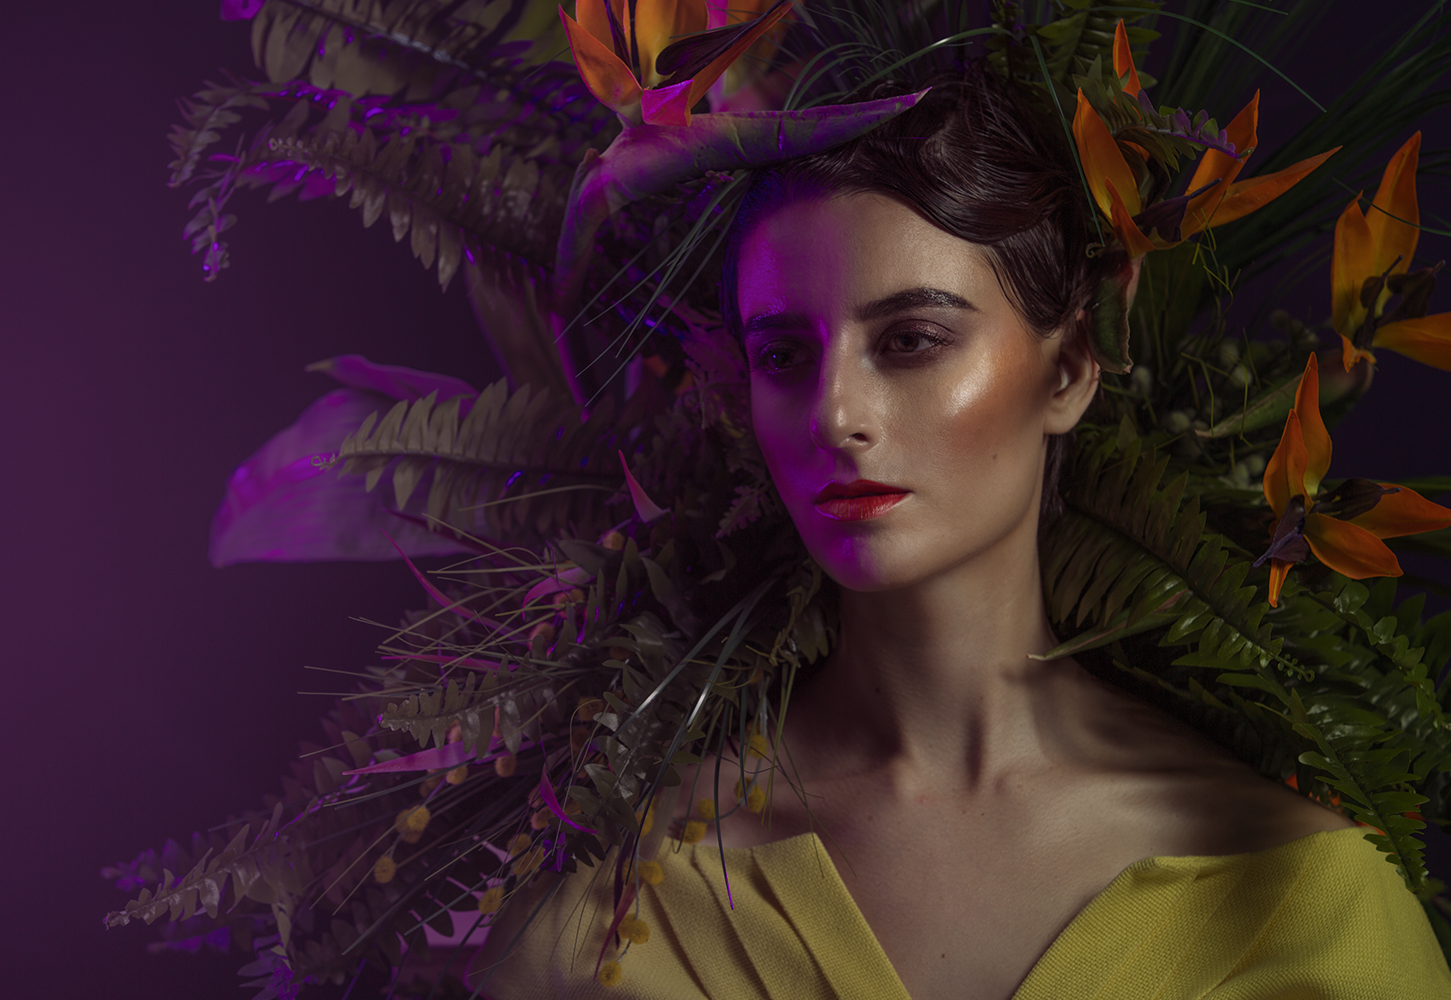 Jungle Fever 2 by Olga Tenyanin